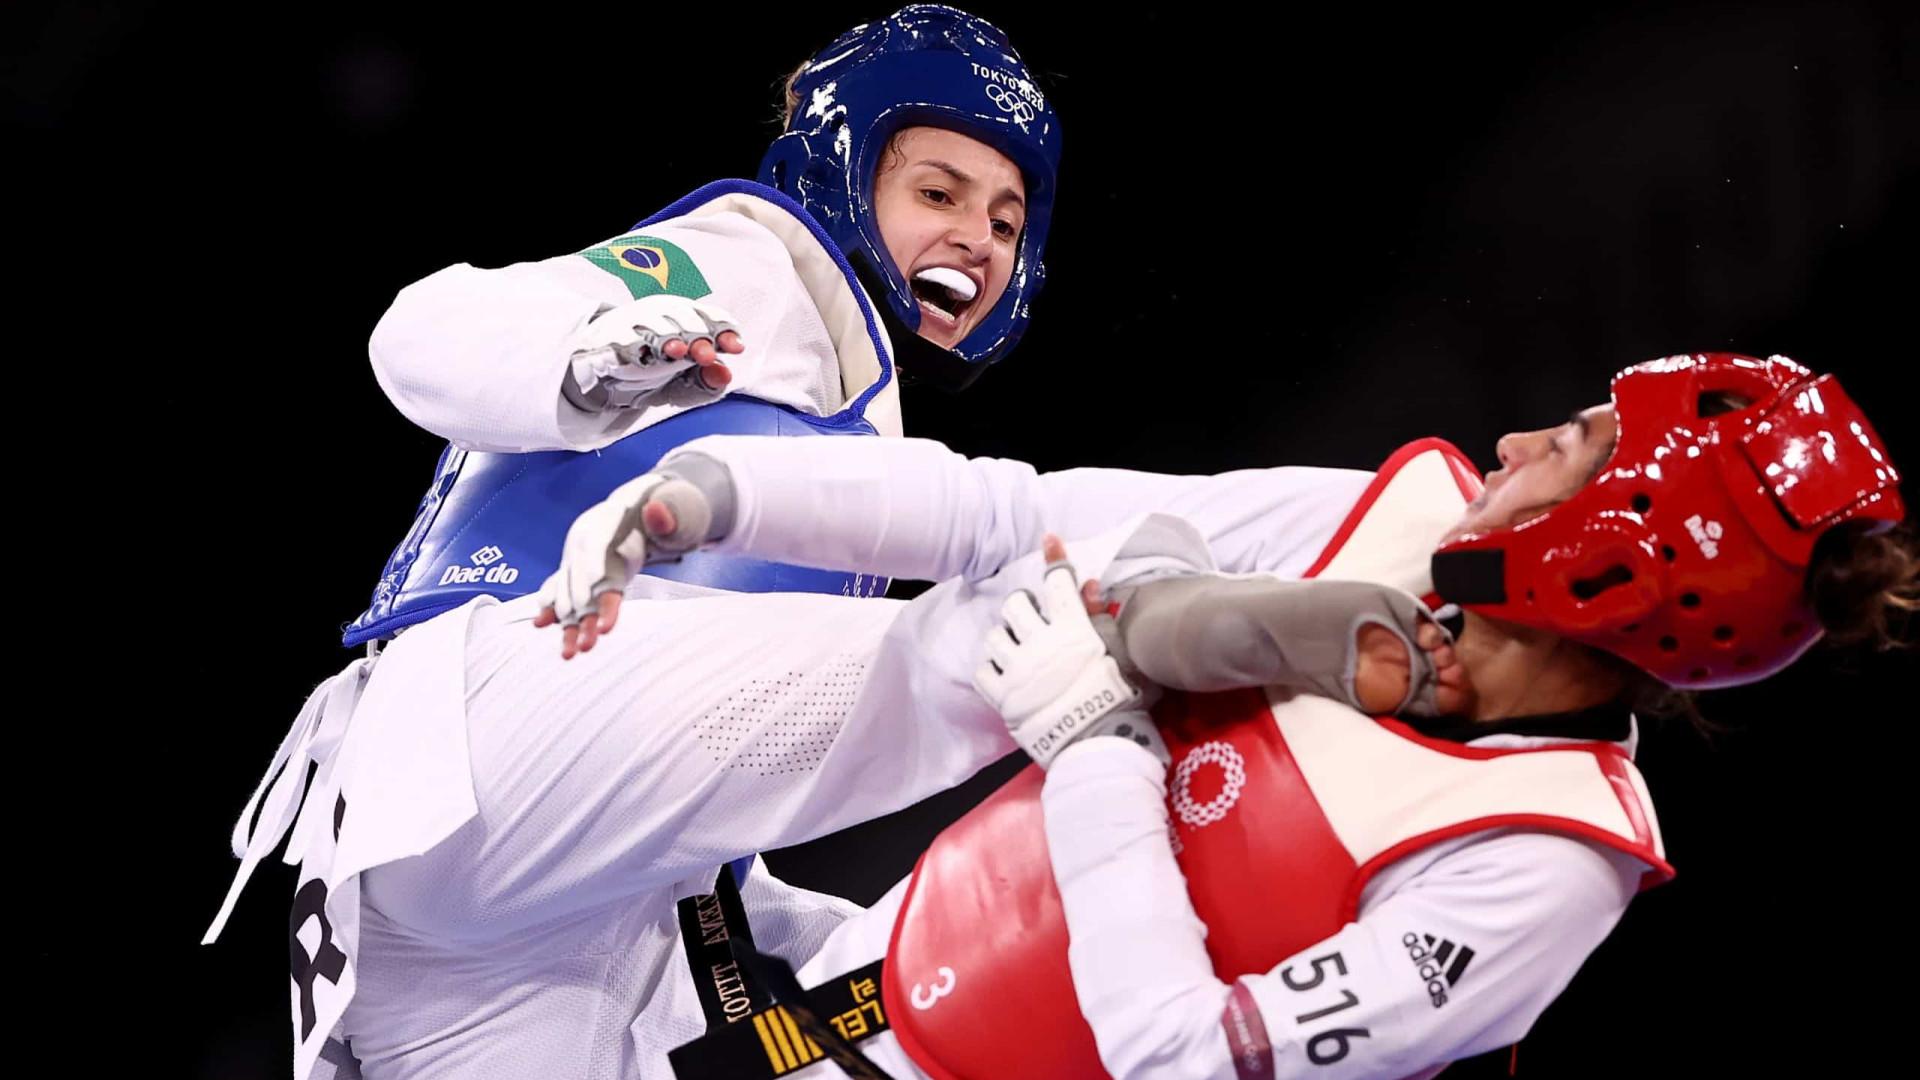 Titoneli vence haitiana e vai disputar a medalha de bronze no tae kwon do